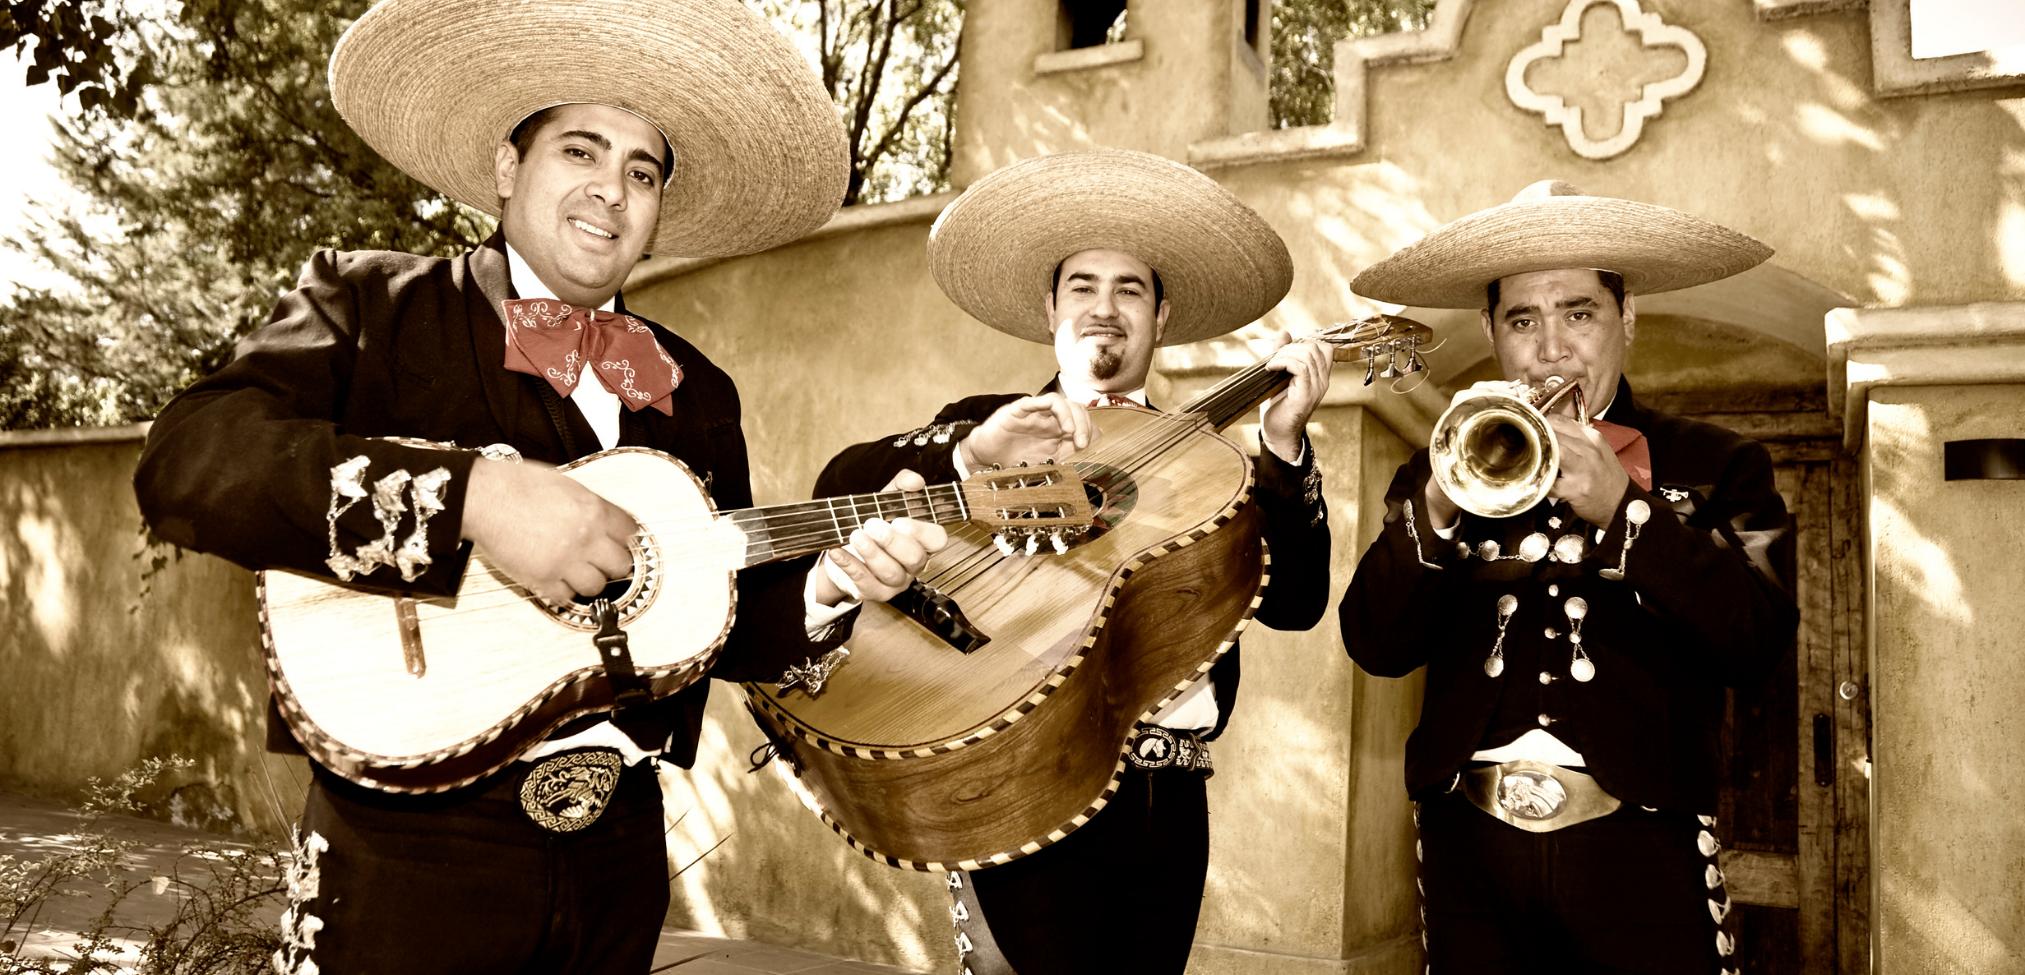 Musik aus Mexiko: Mariachi